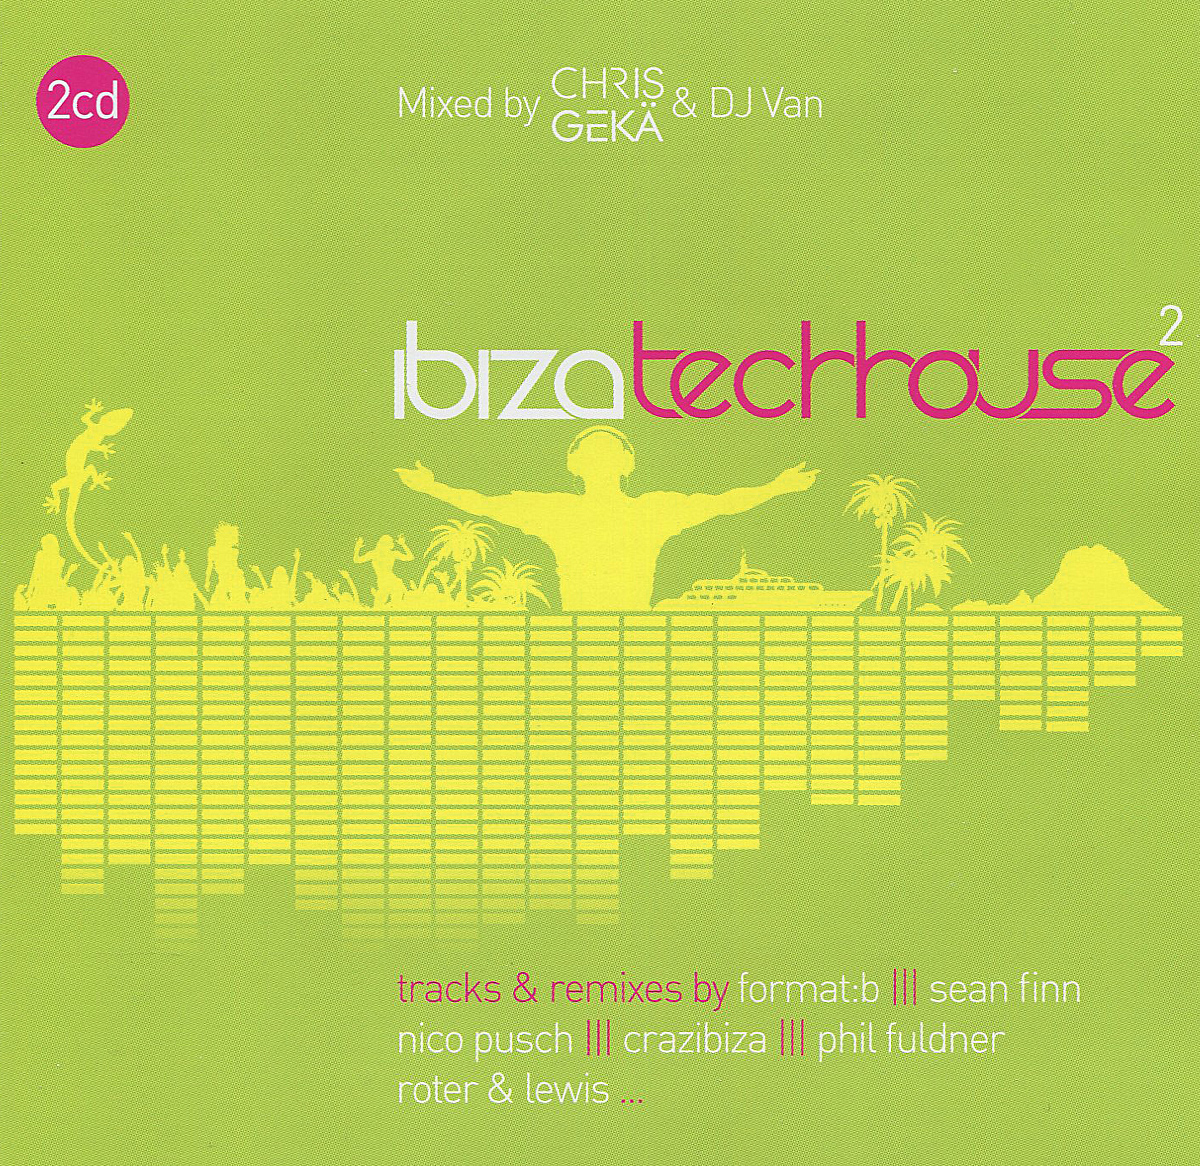 BK Duke,Mea,Рони Голдинг,Стэнни Абрам,The Cube Guys,Дэни Кохиба,Кармен Электра,Эдди Амадор,Audiomodelz,Ultra Nate,Nico Pusch,Andy B. Jones,Disco Fries,Cappella,Фил Фулднер,Полина Гриффис,Dj A.N.D.Y.,DJ Van,Crizzn Ibiza Tech-House 2 (2 CD) disco house 2016 2 cd